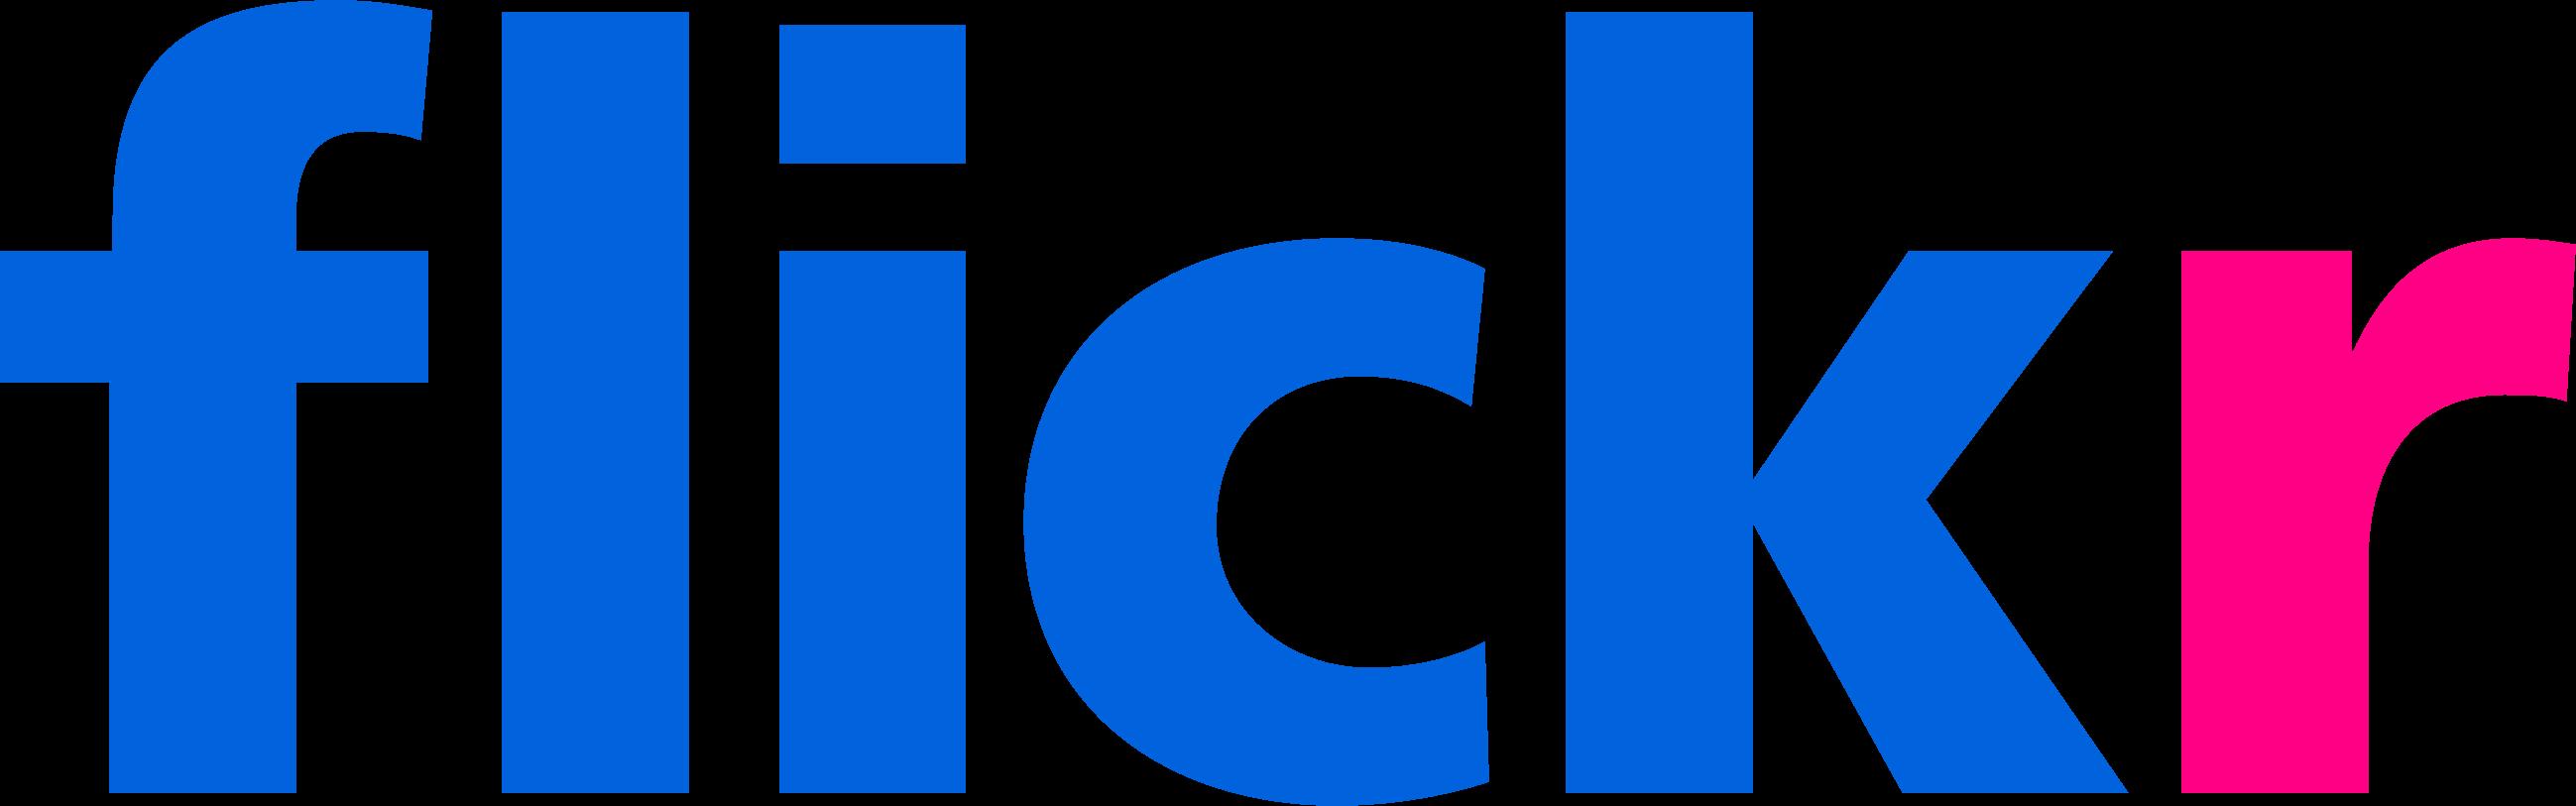 Flickr Creative Commons Logo